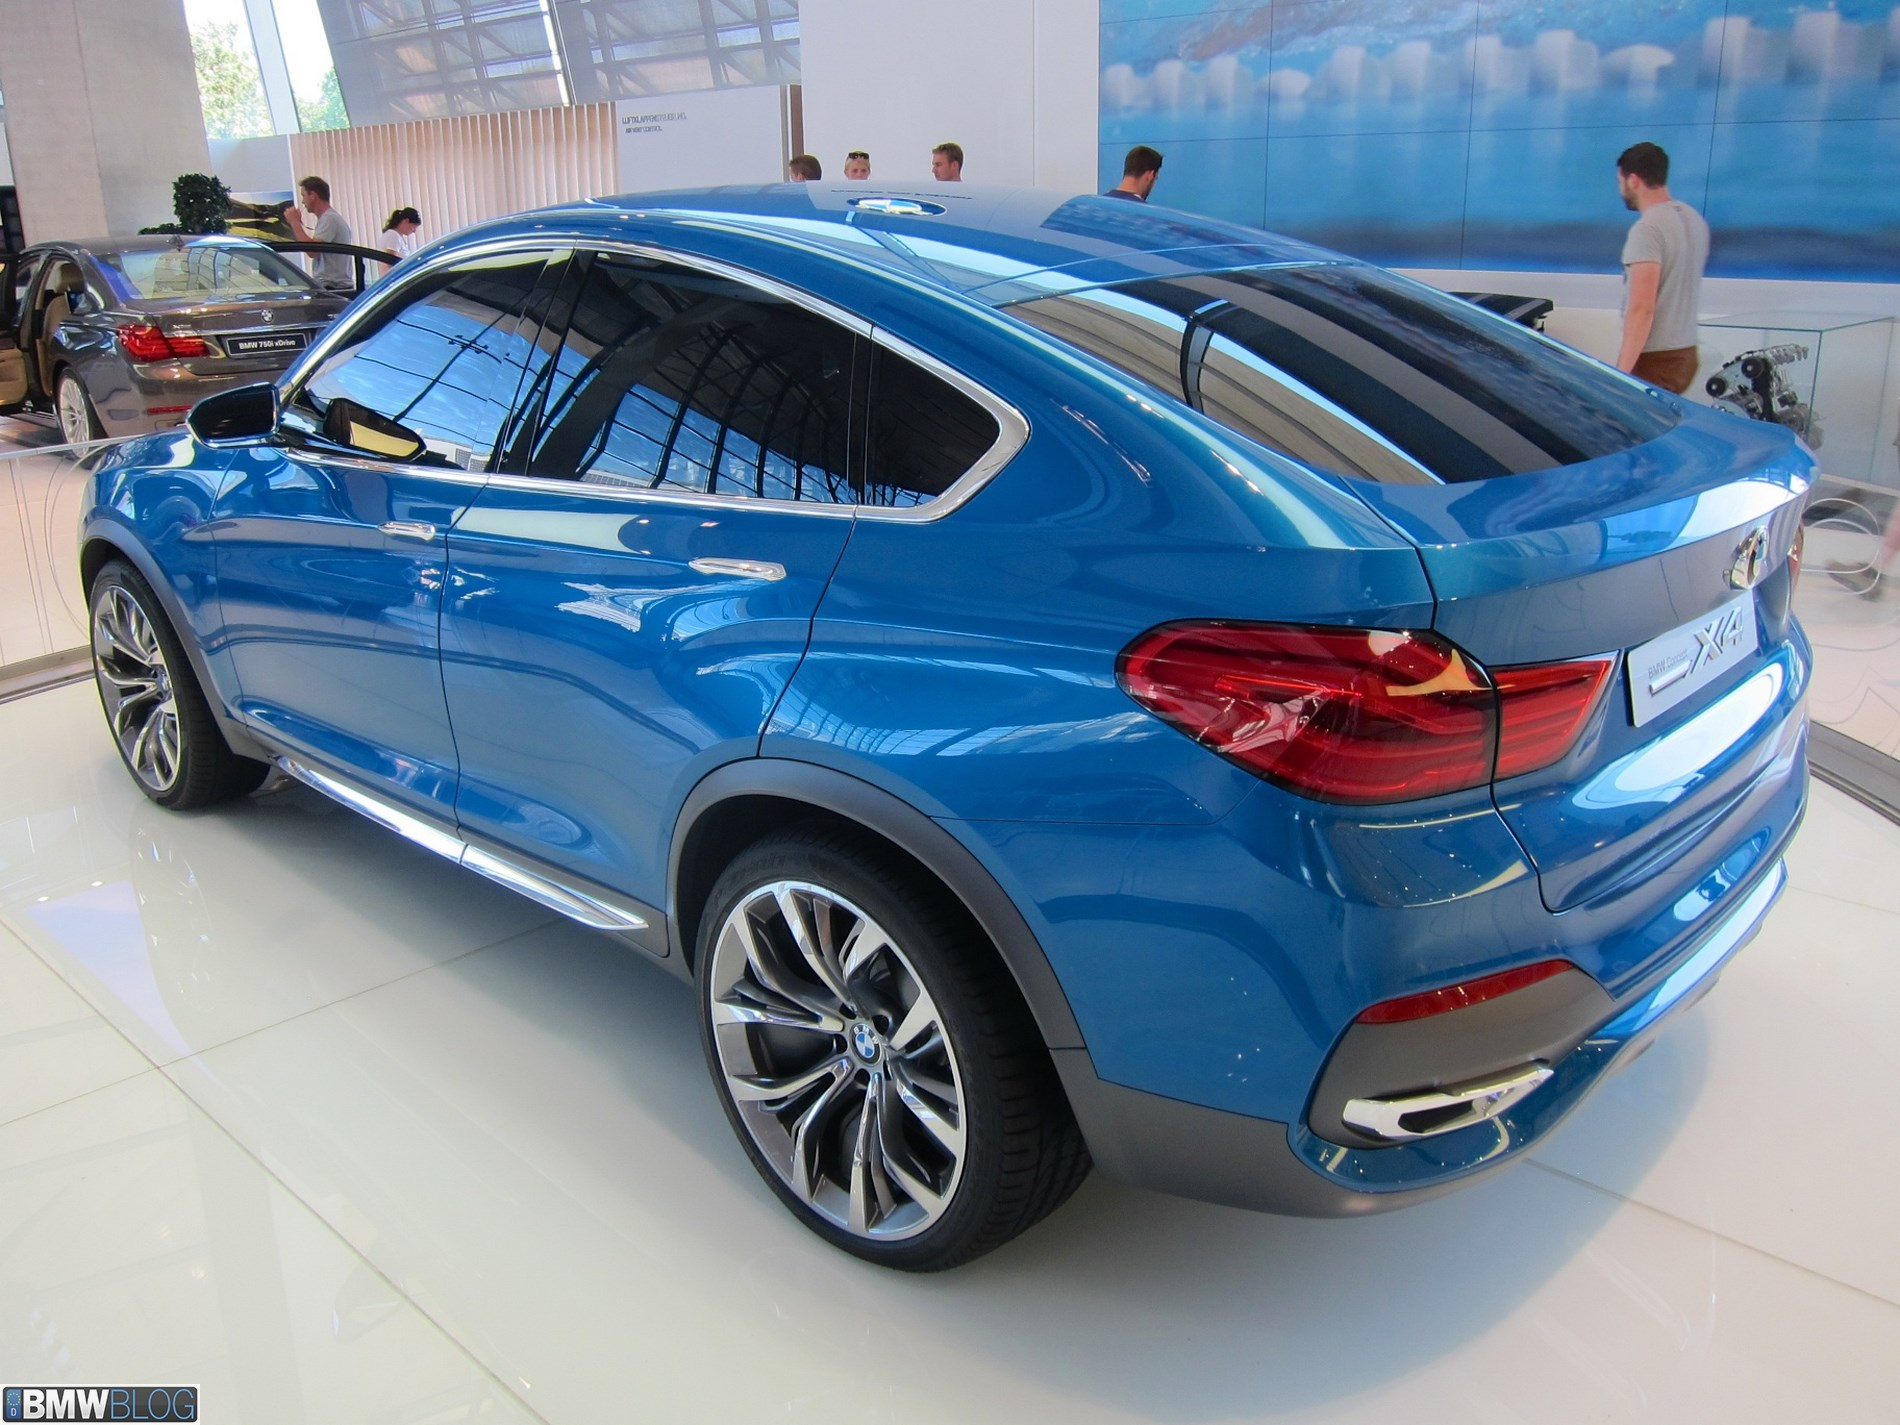 Top BMW X4, X3, and X6 styling comparison - BMW X4 Forum &OC_62